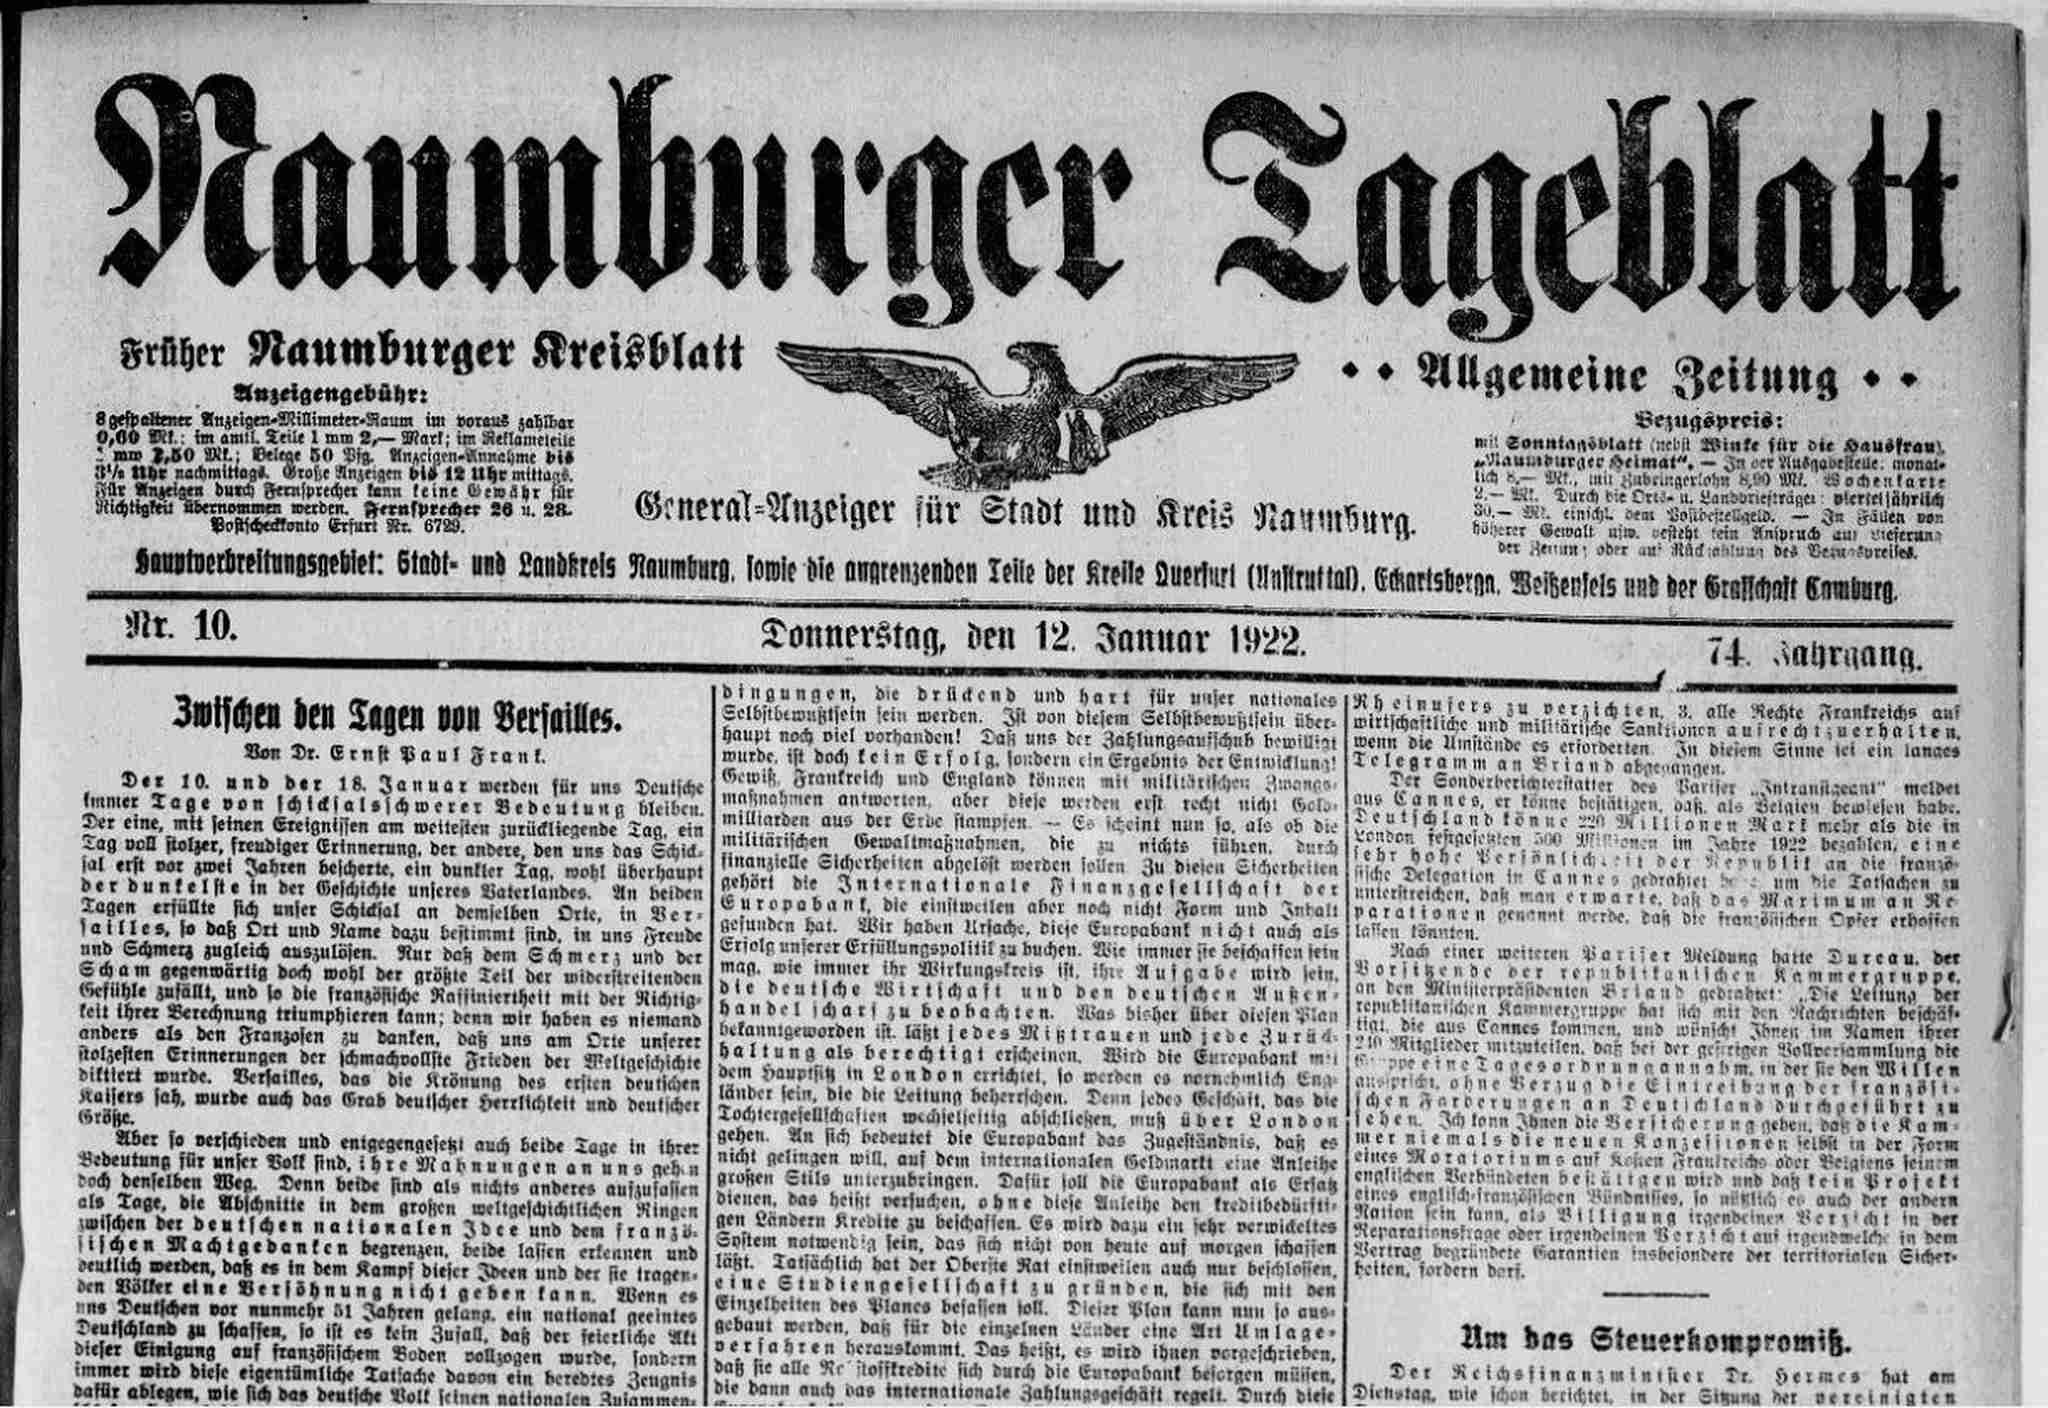 Archiv des Naumburger Tageblatts